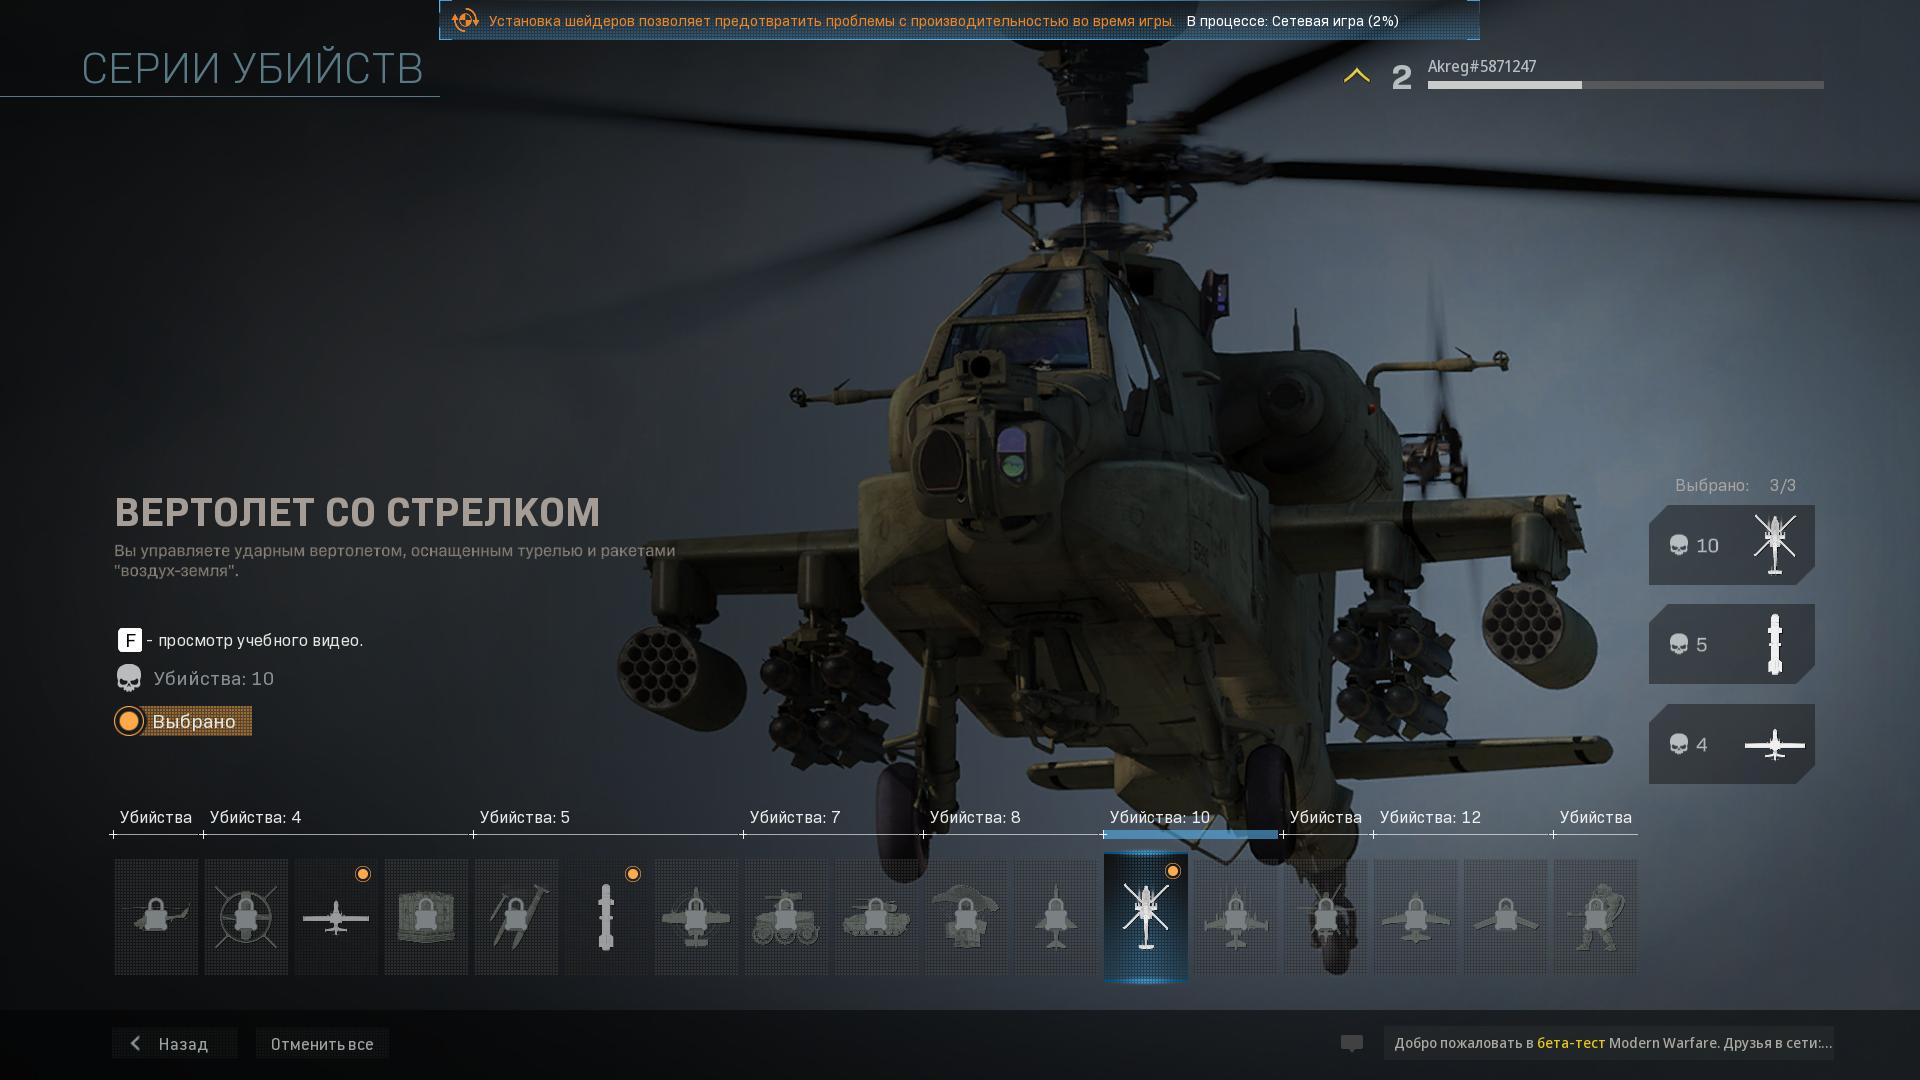 Вертолёт со стрелком